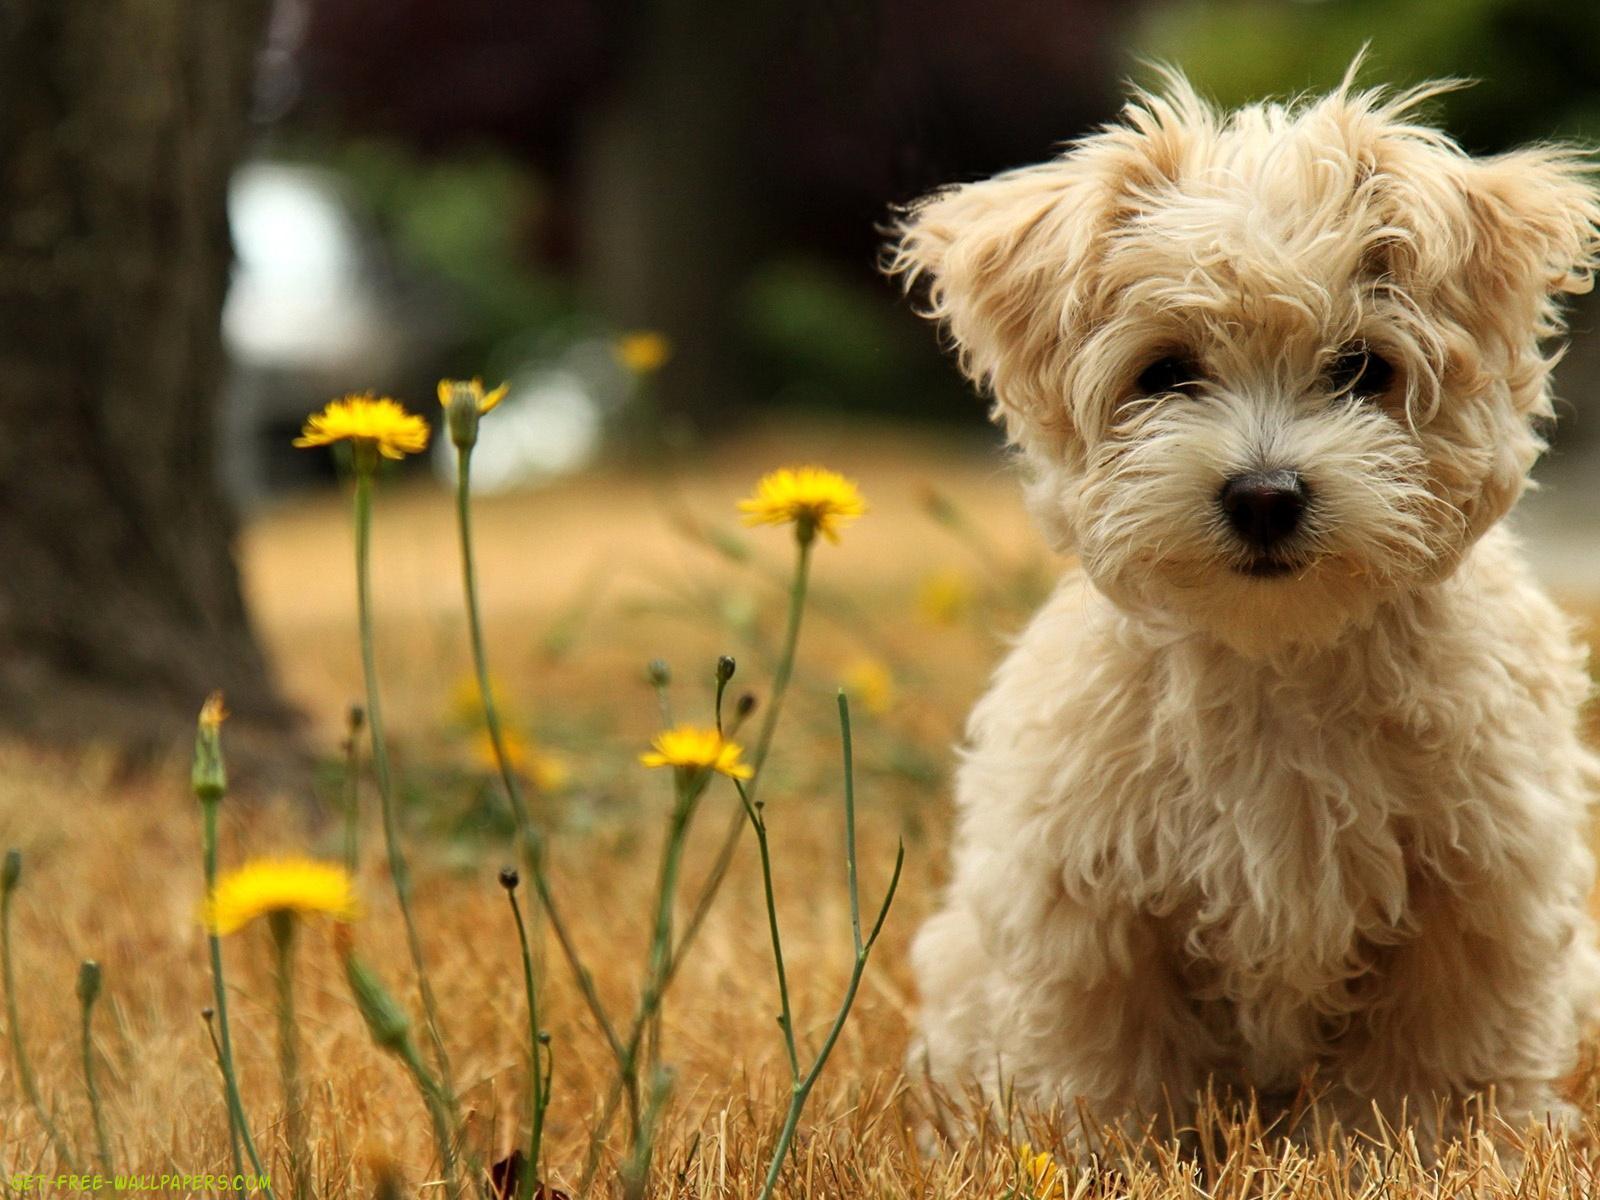 Download Puppy Wallpaper 1600x1200